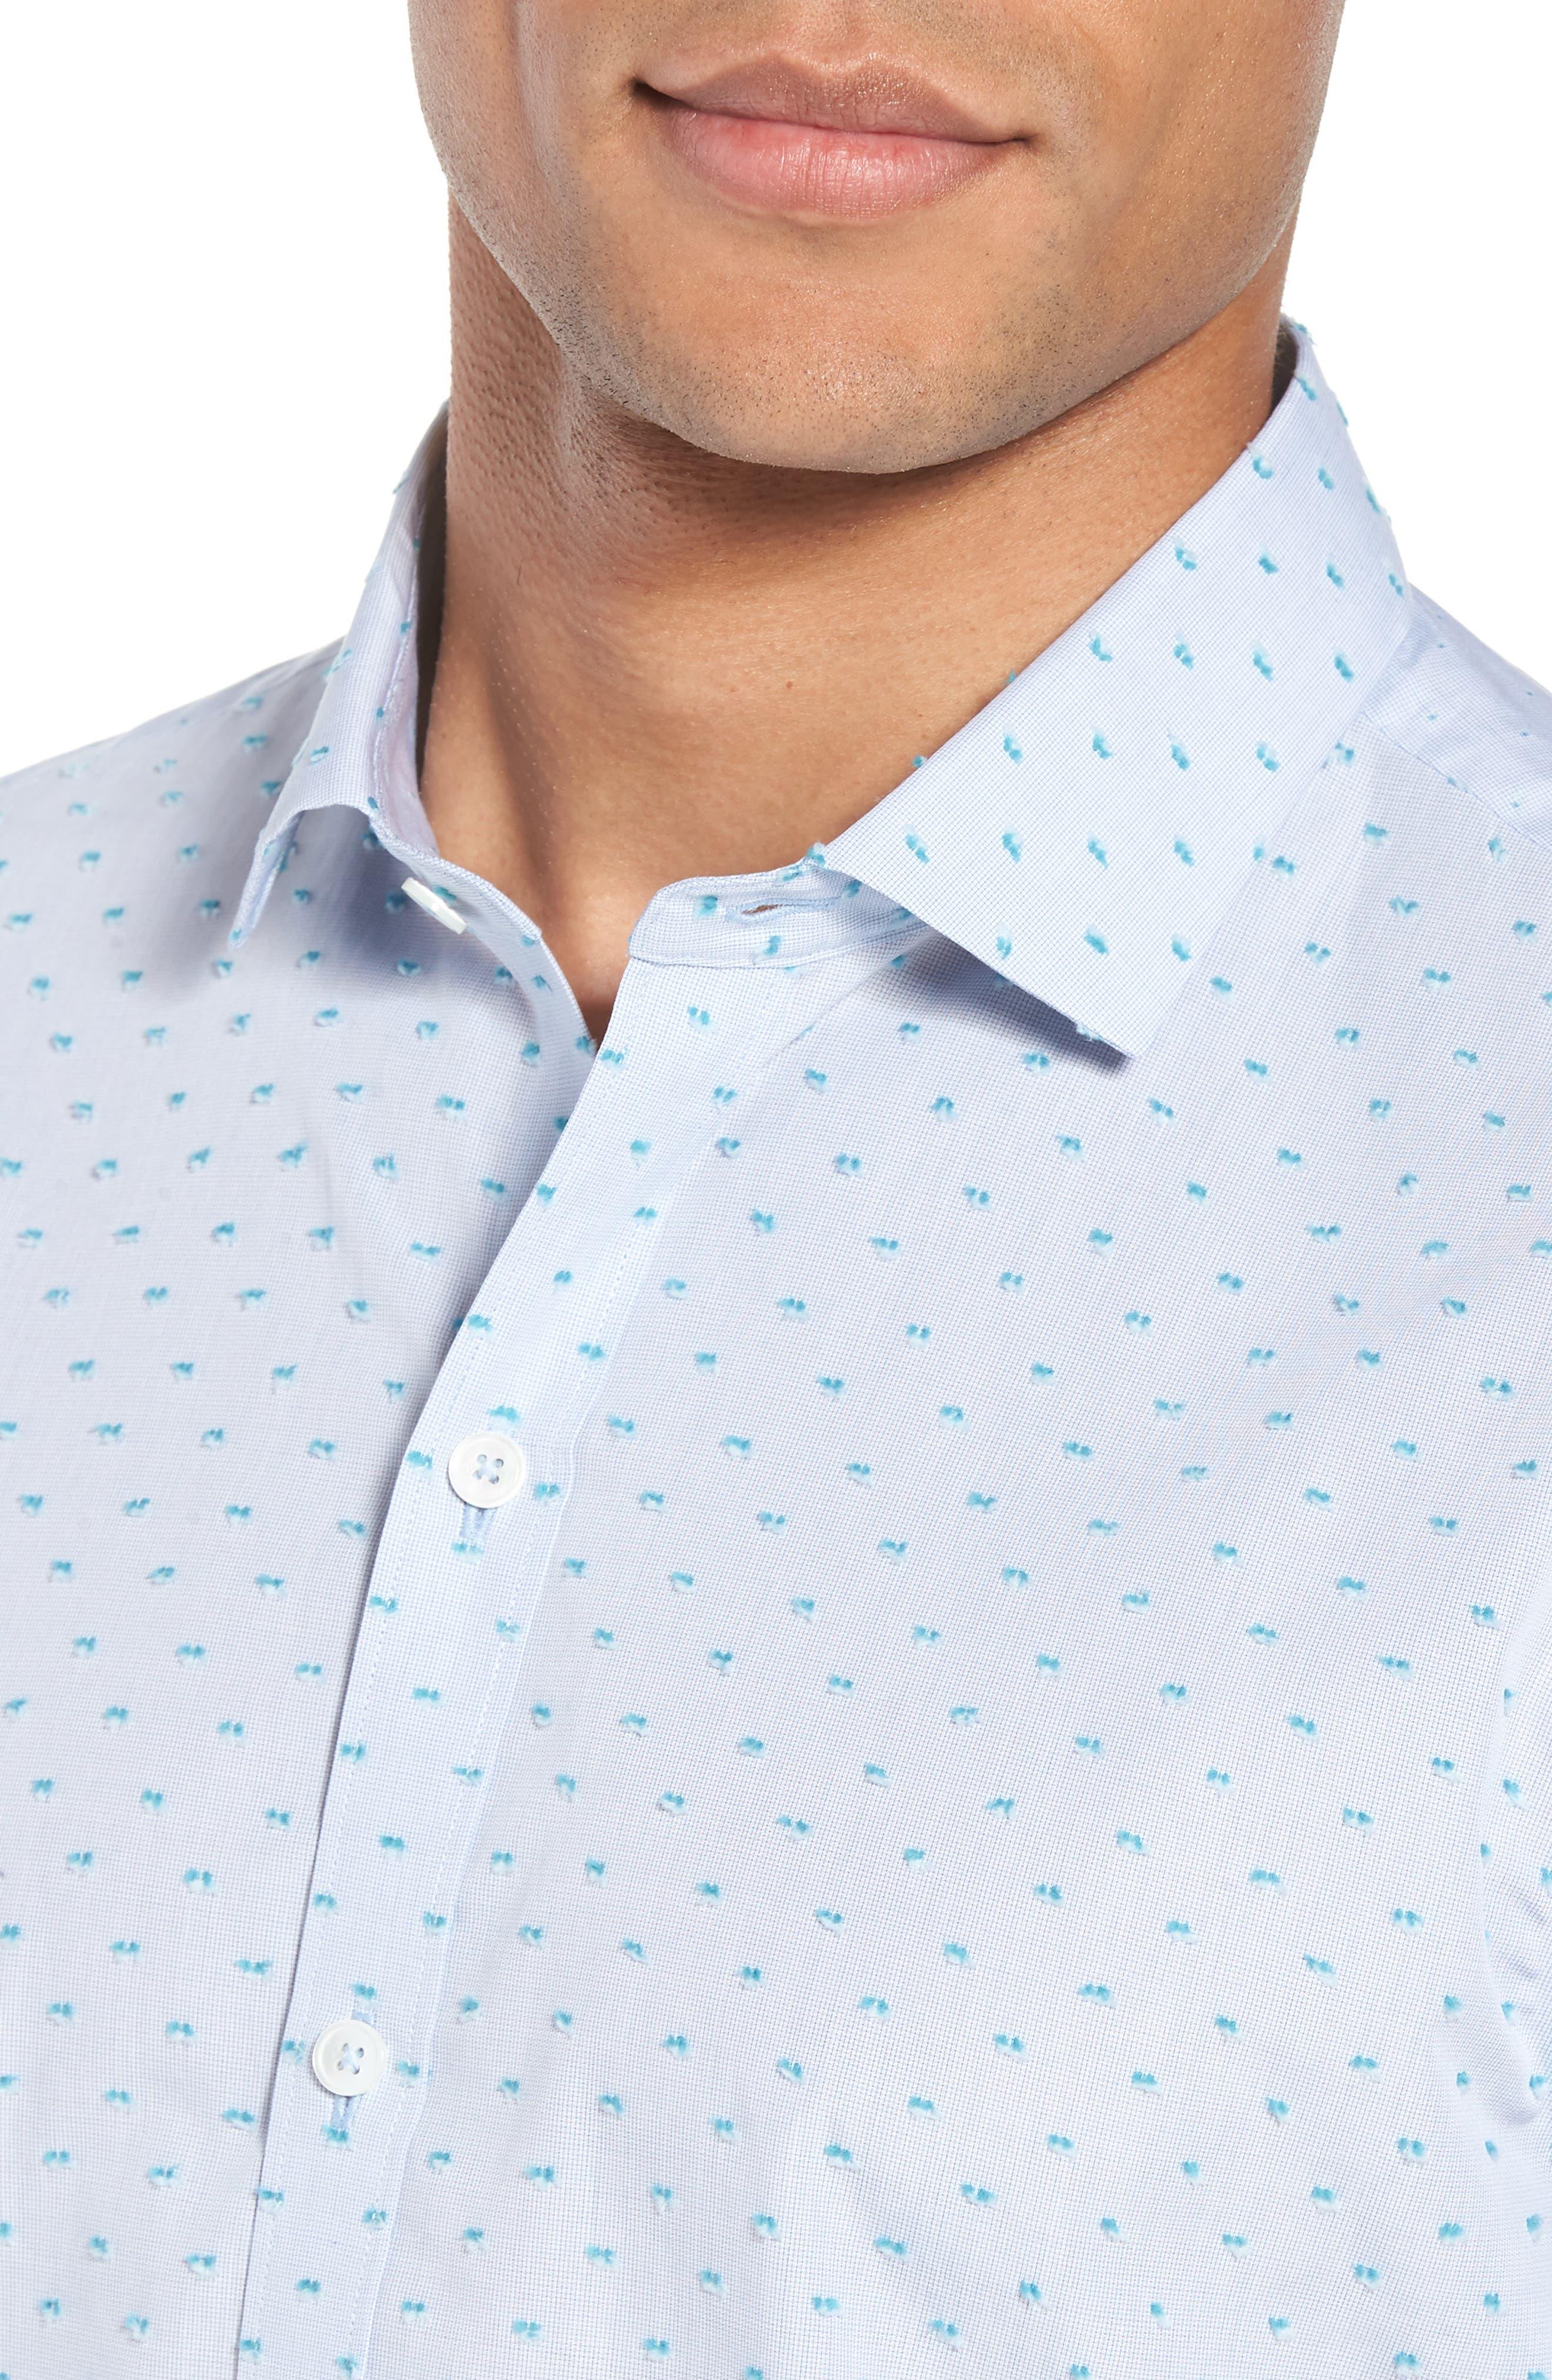 Dolle Fil a Coupe Sport Shirt,                             Alternate thumbnail 4, color,                             450